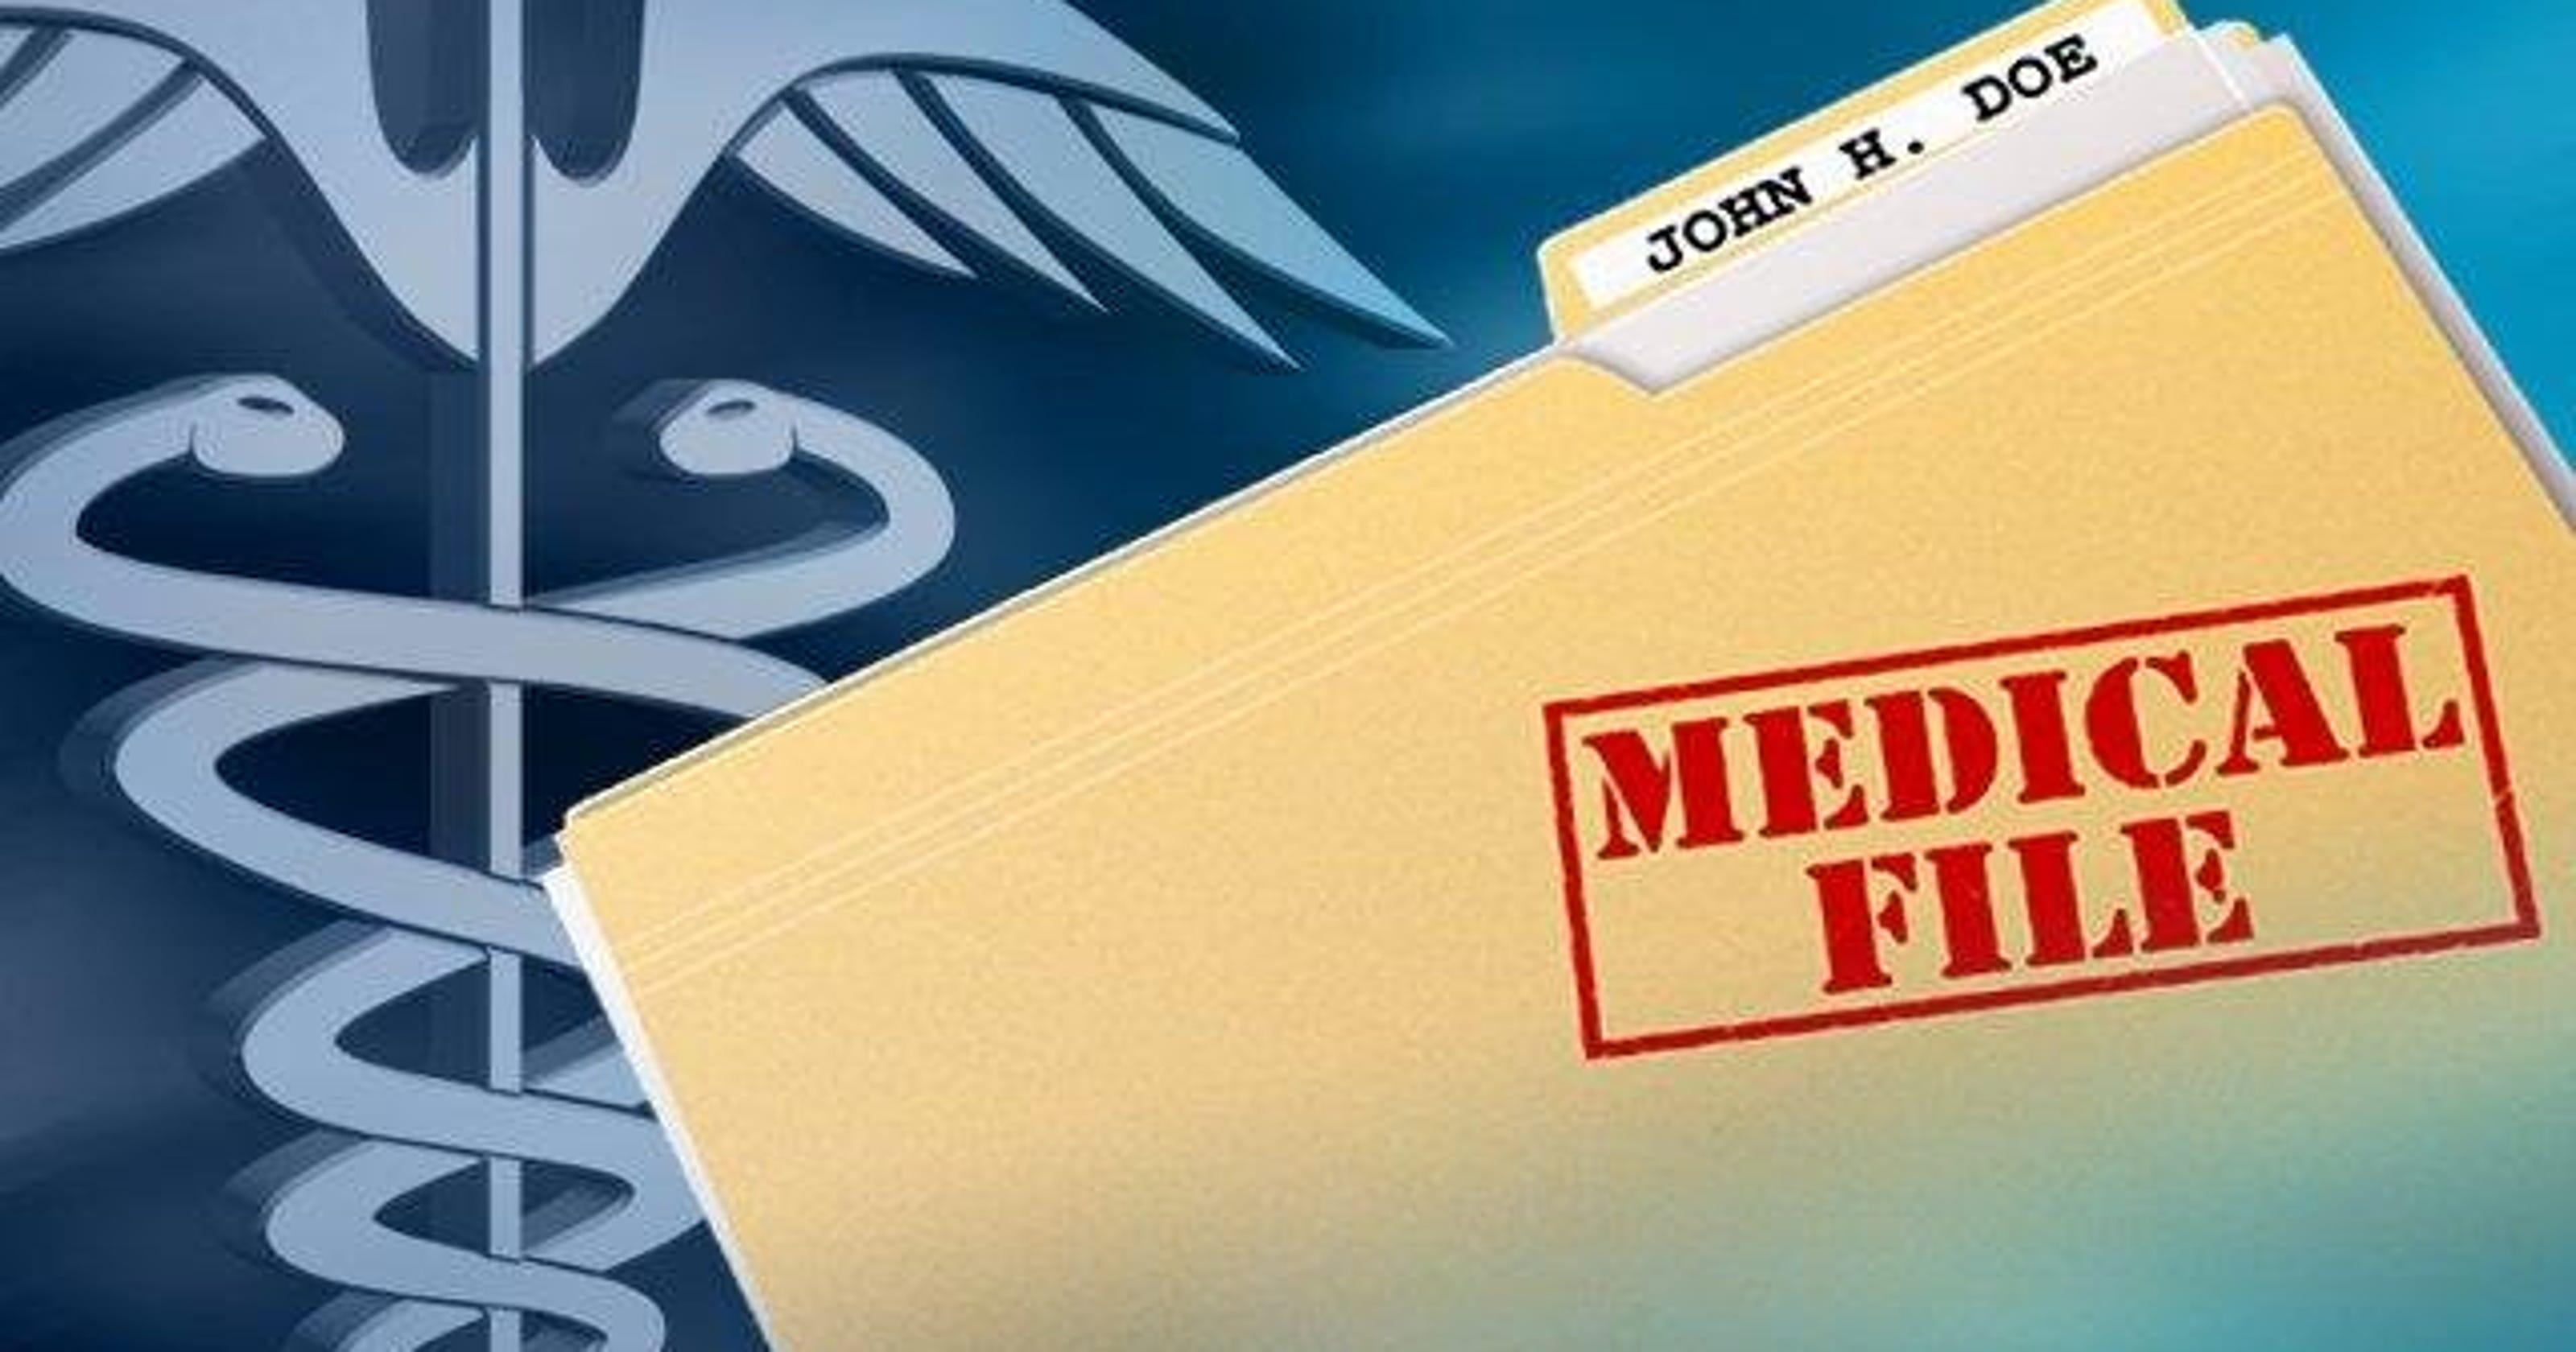 Michigan appeals court dismisses lawsuit over leaked medical